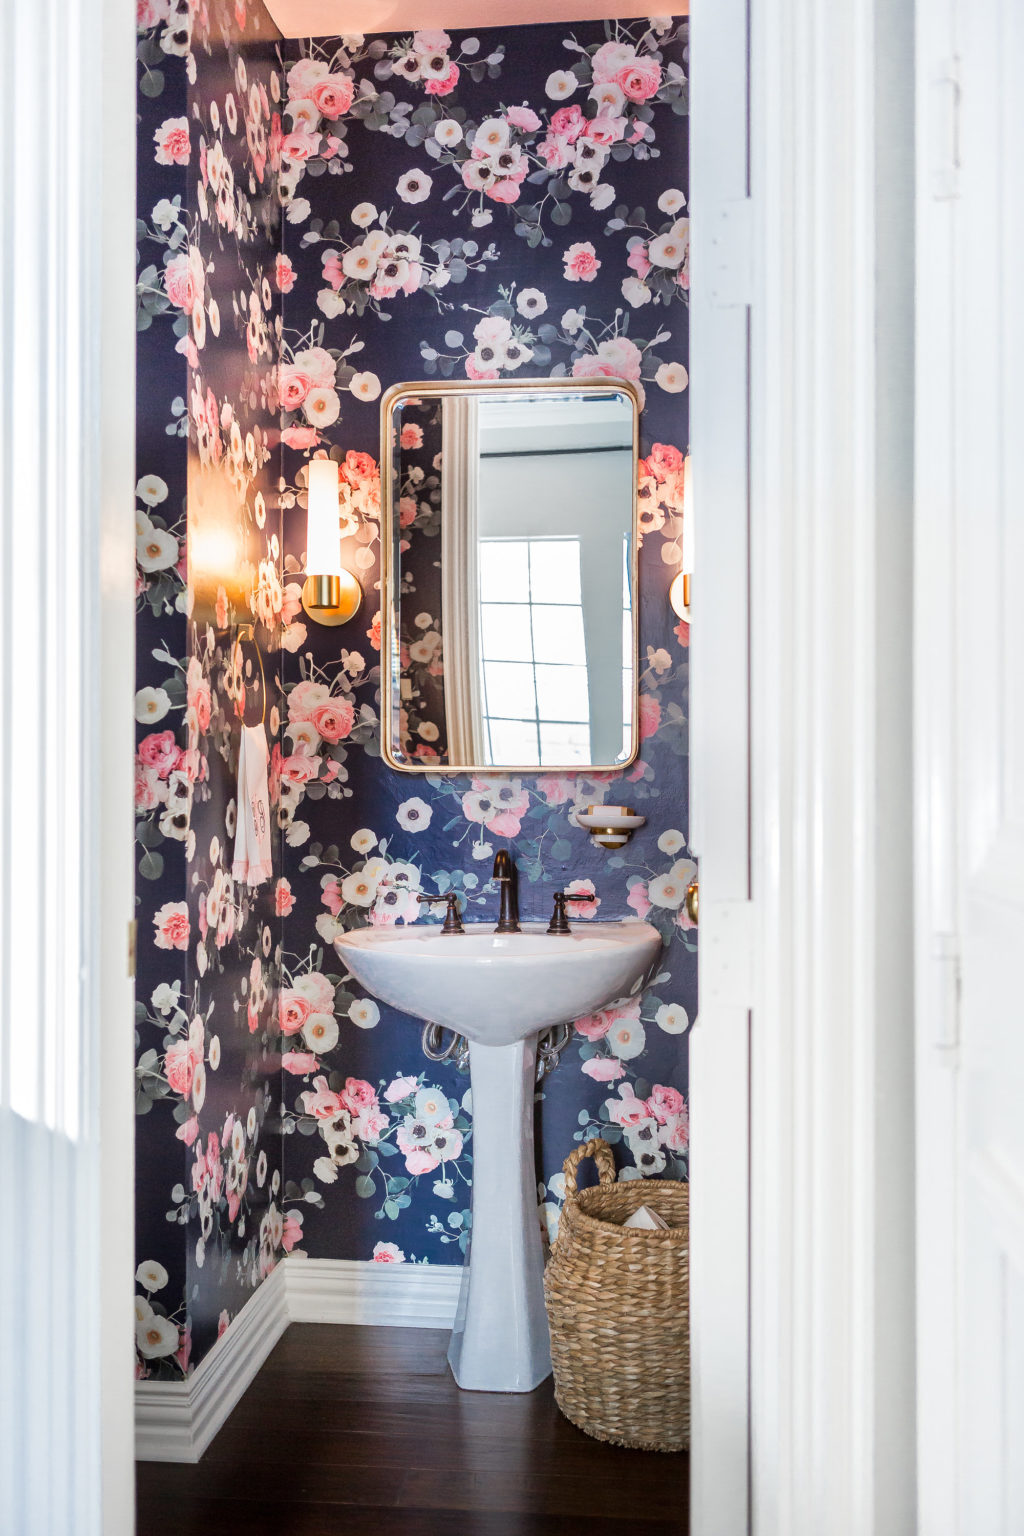 Powder bath the reveal hi sugarplum bloglovin Hi sugarplum